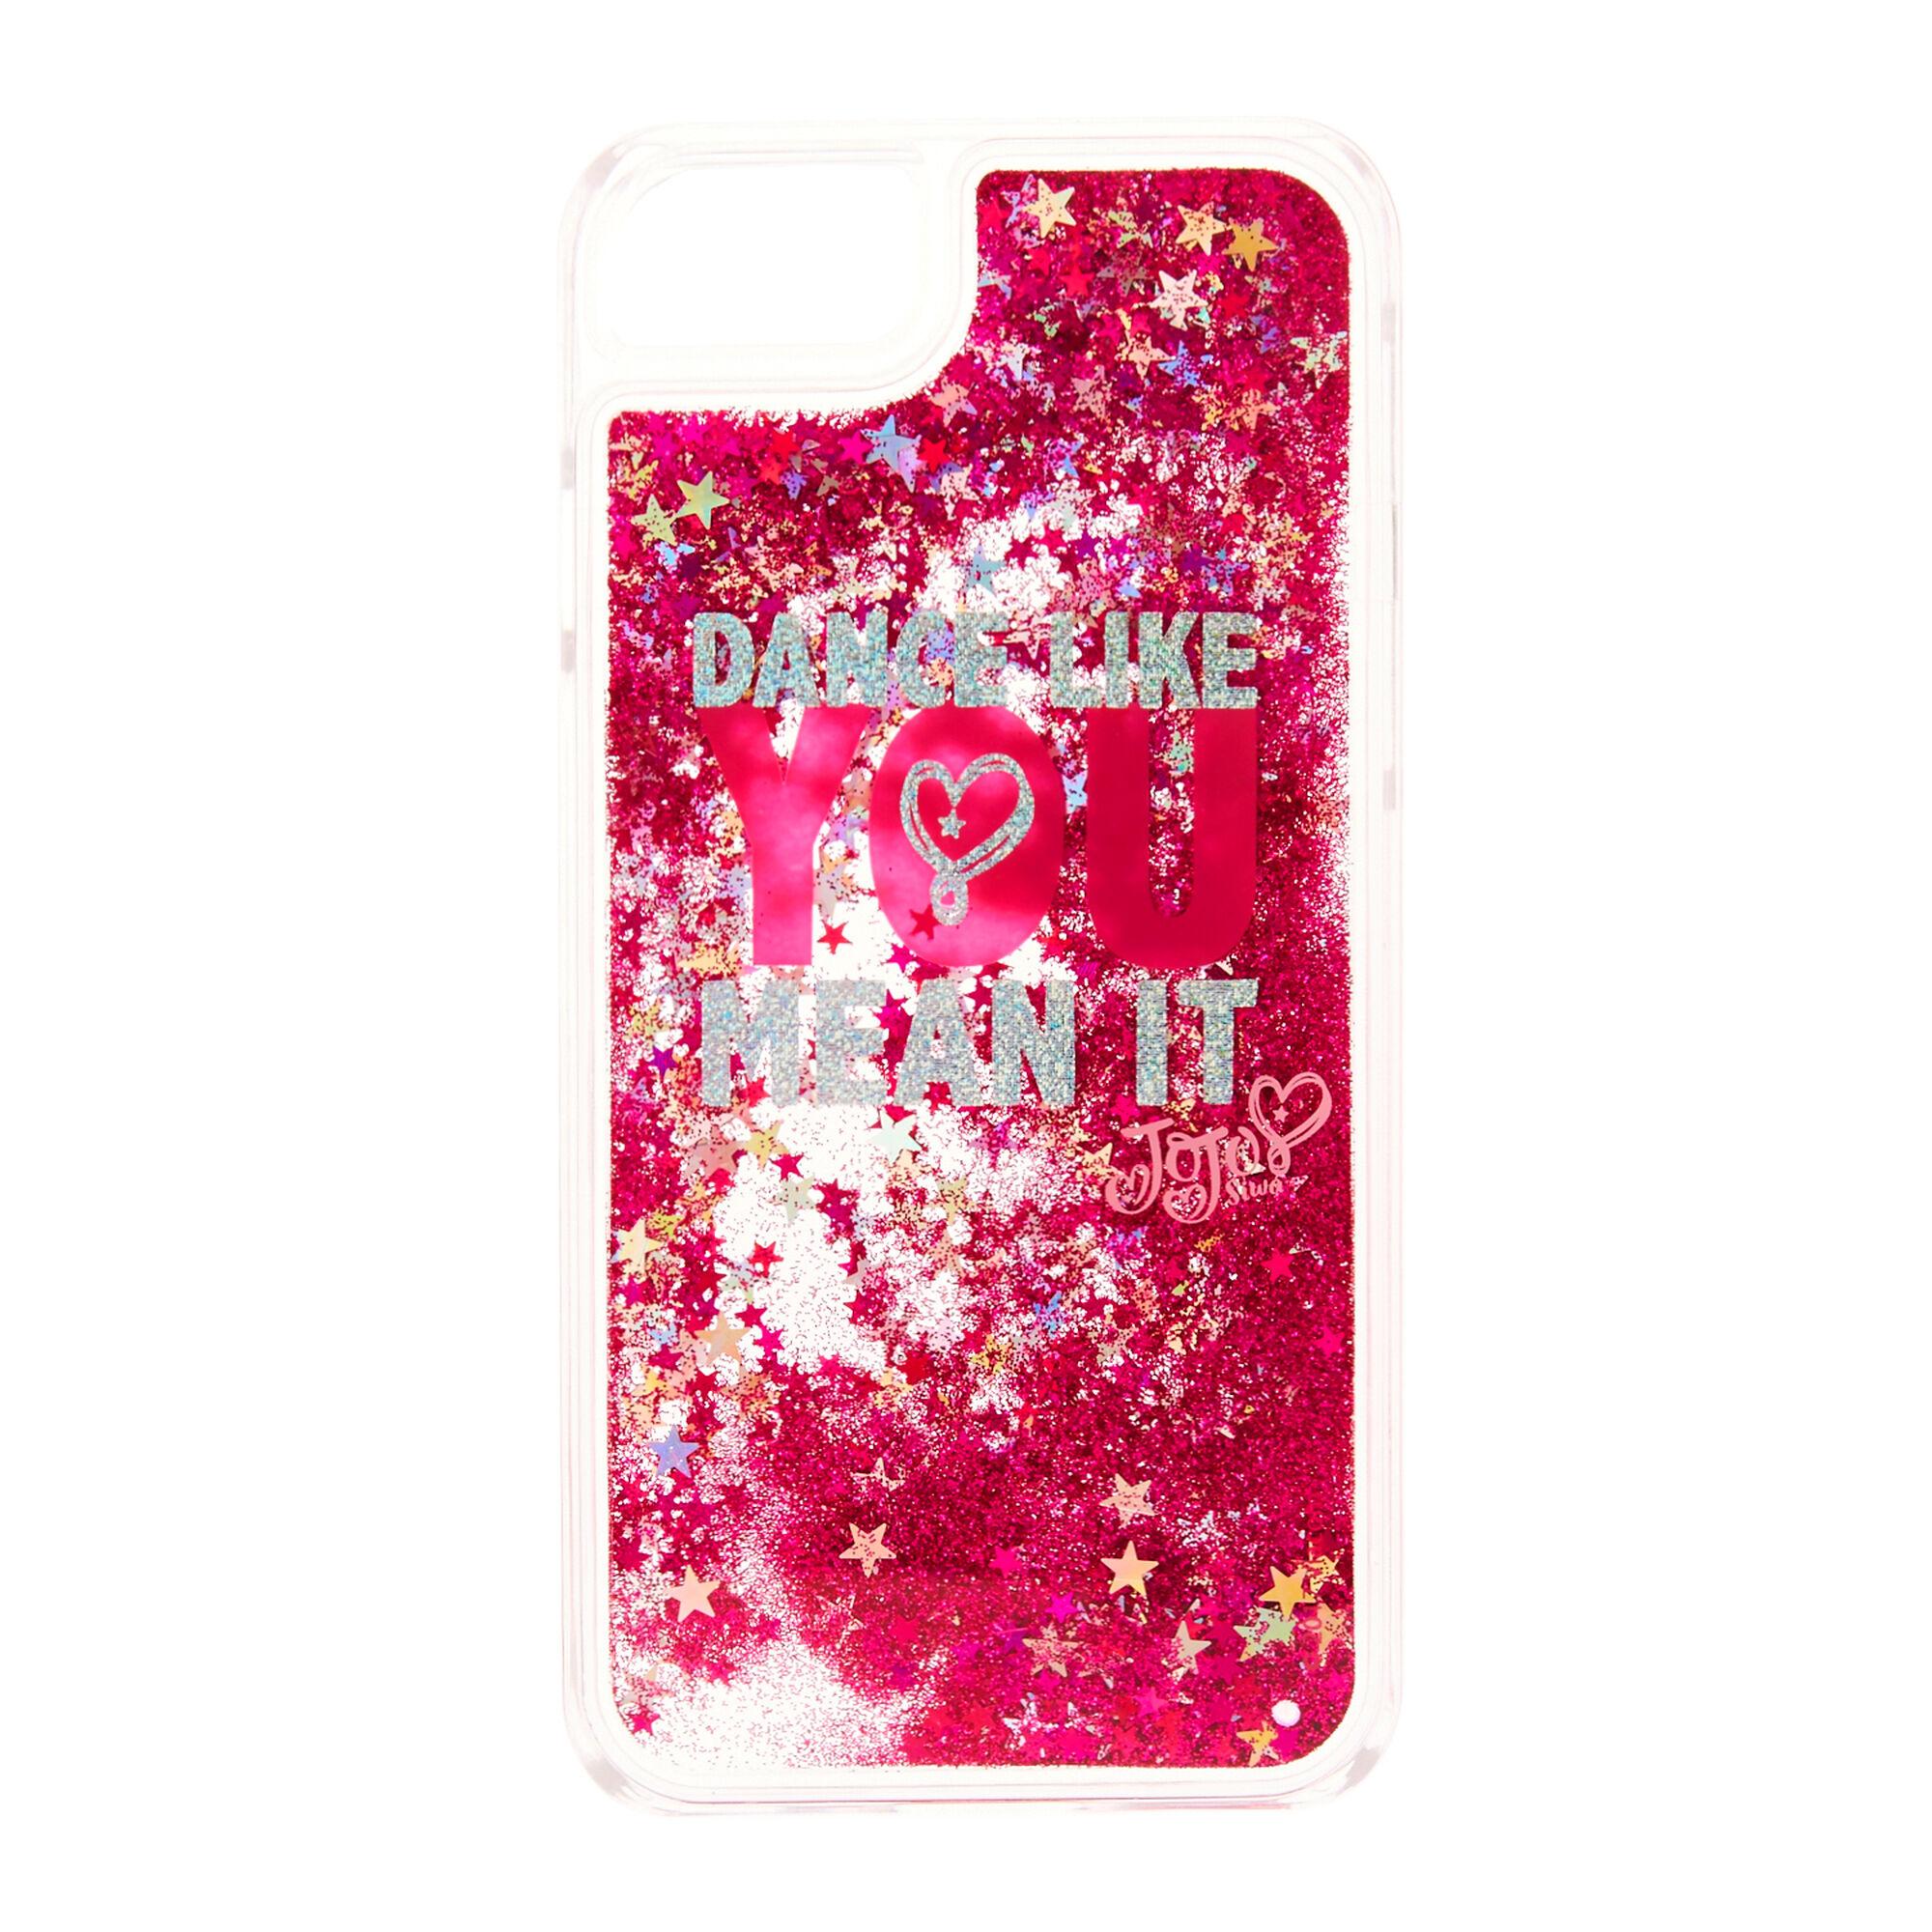 buy popular 0af82 bce9c JoJo Siwa™ Dance Like You Mean It Glitter Phone Case - Fits iPhone 6/7/8